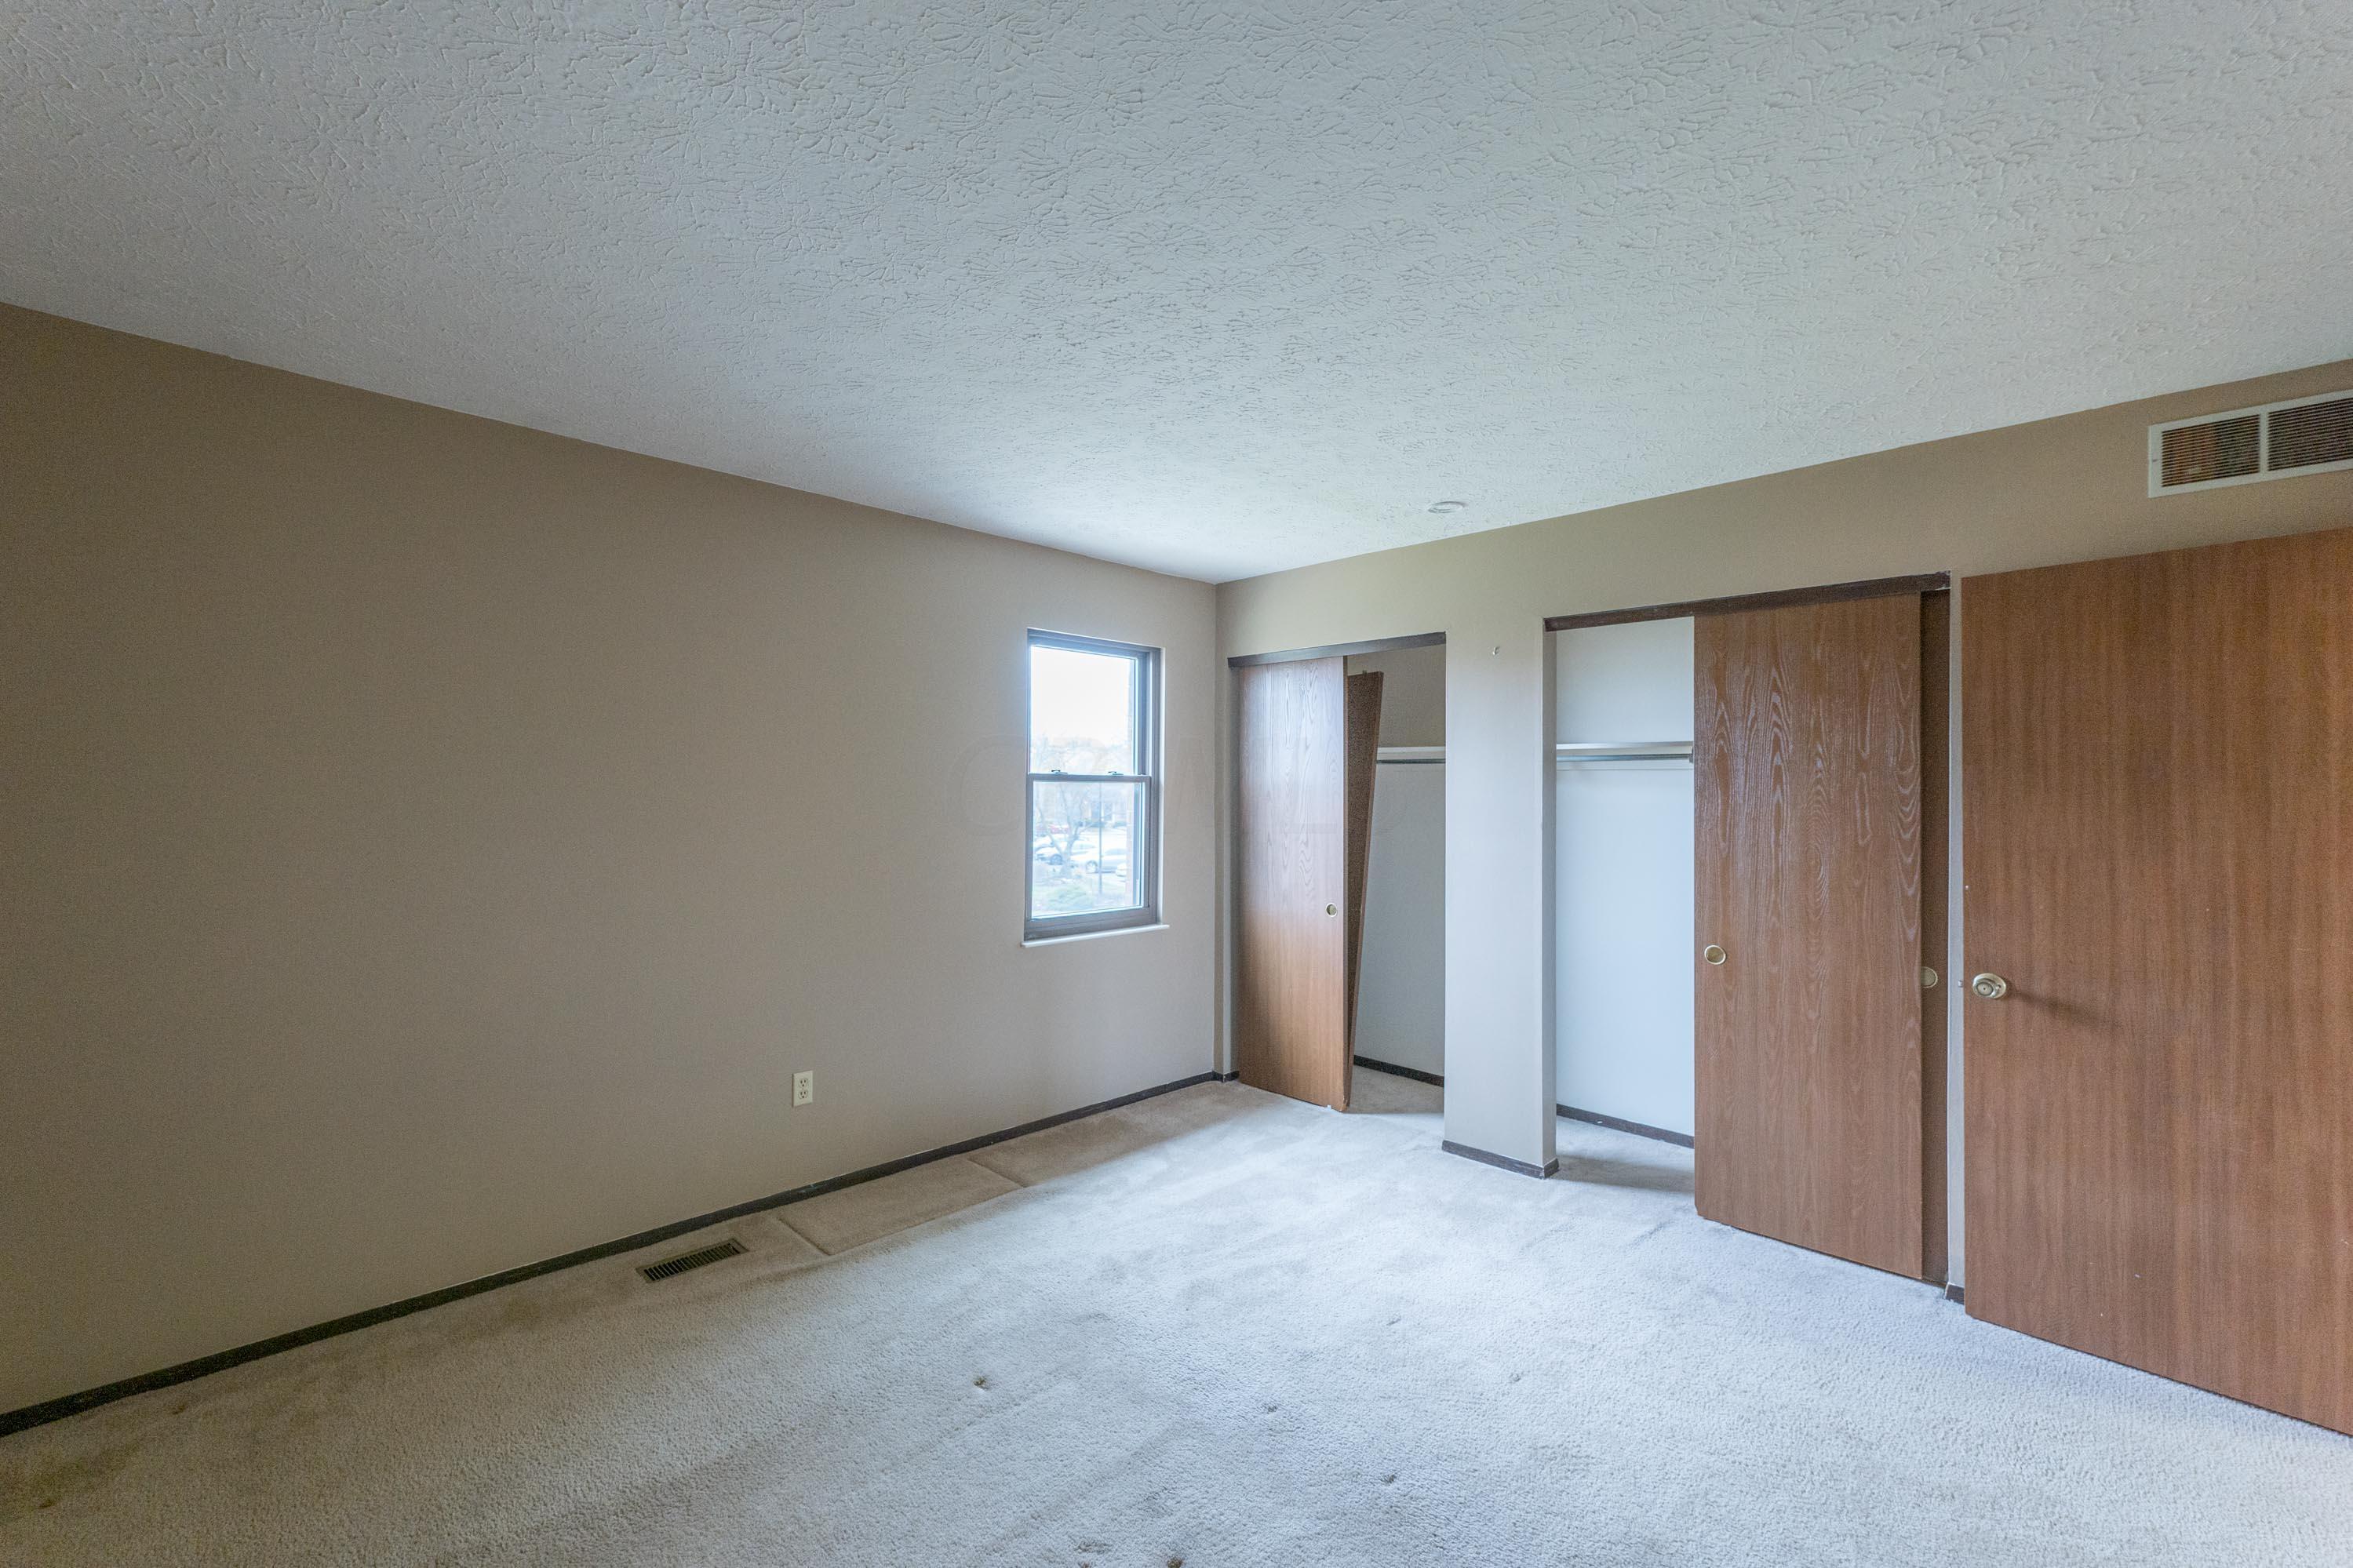 7927 Verandah Court, Powell, Ohio 43065, 2 Bedrooms Bedrooms, ,2 BathroomsBathrooms,Residential,For Sale,Verandah,221000145